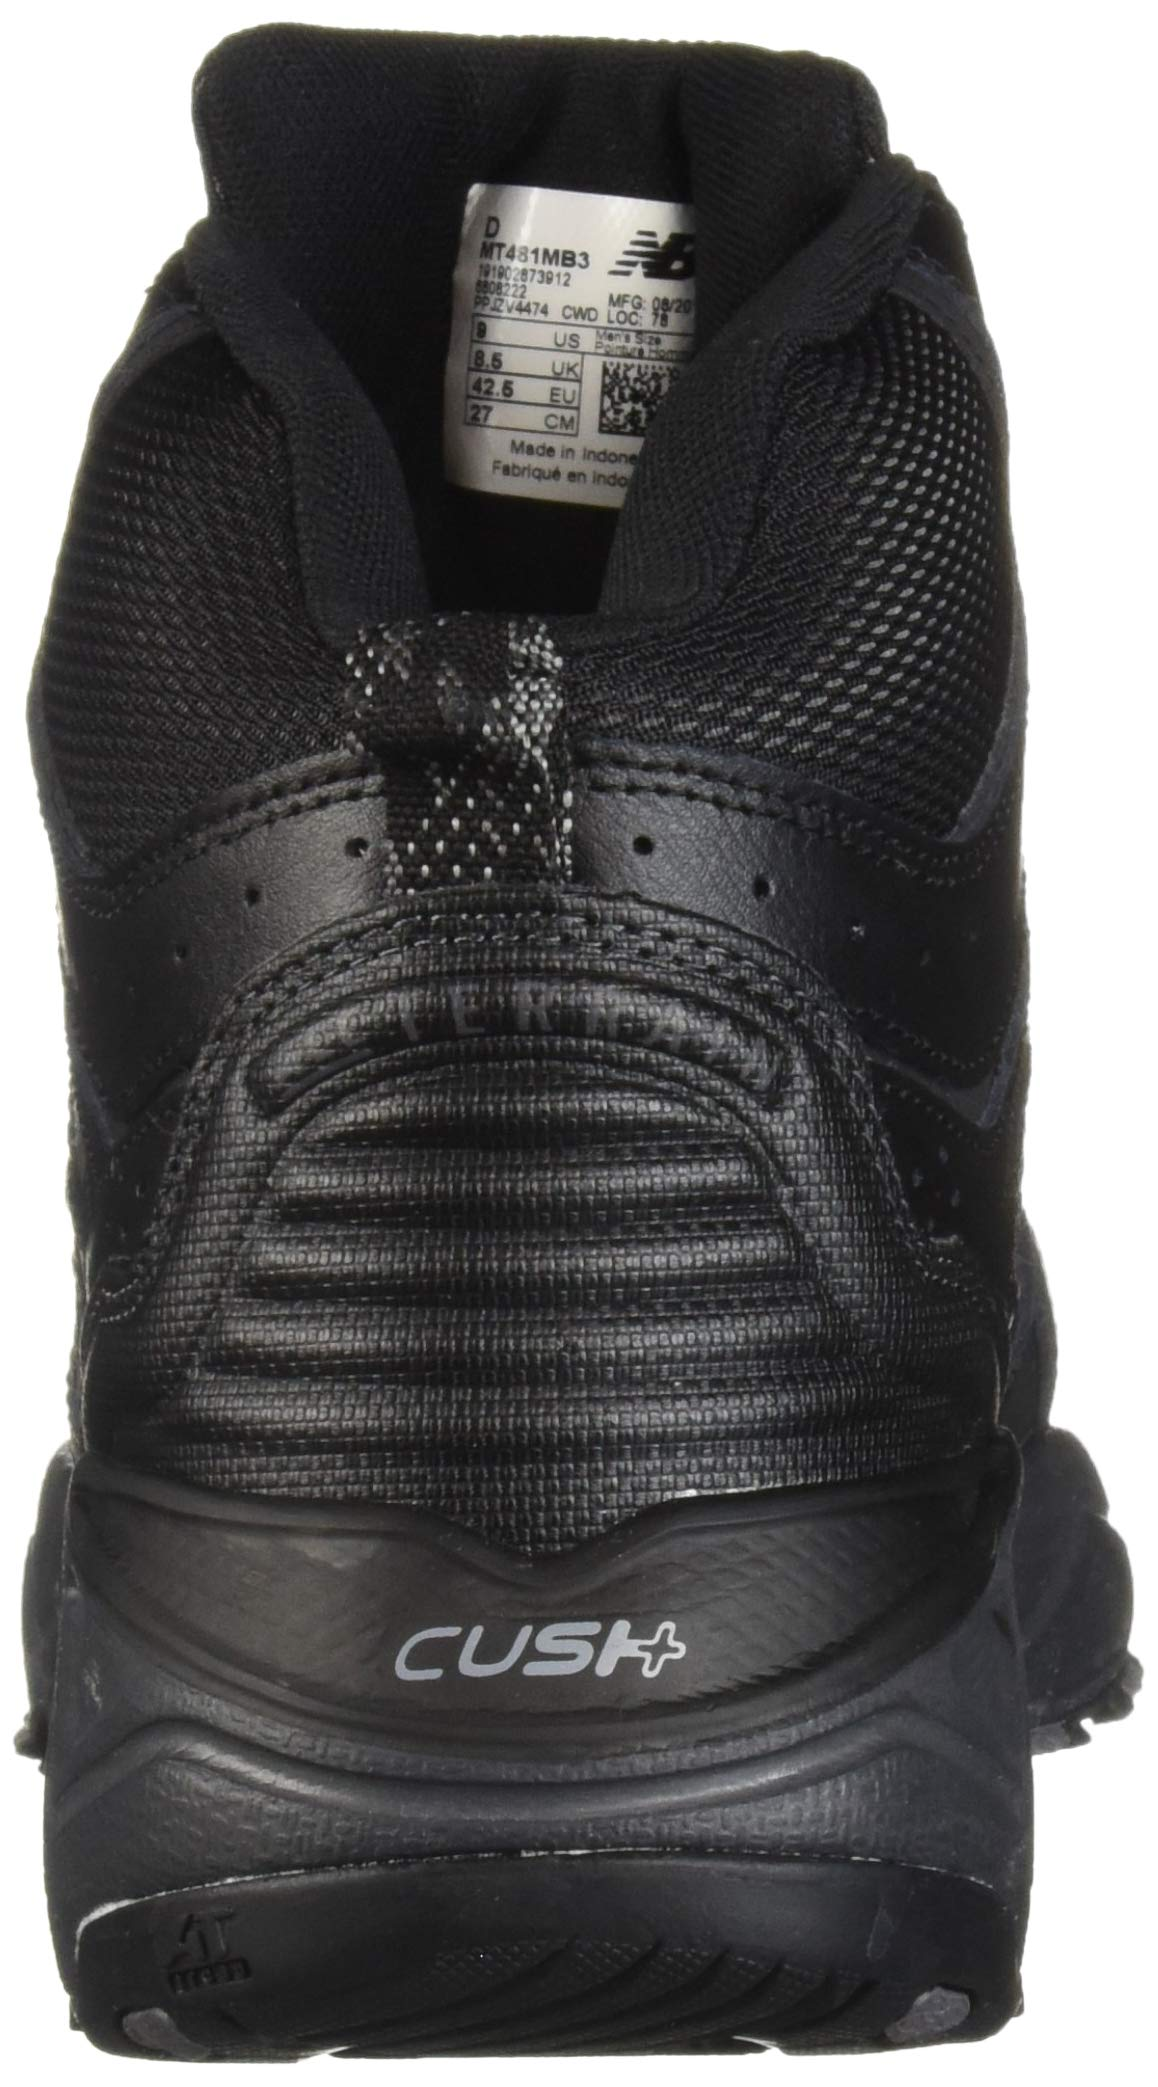 New Balance Men's 481 V3 Cushioning Trail Running Shoe Black/Magnet 9.5 D US by New Balance (Image #2)